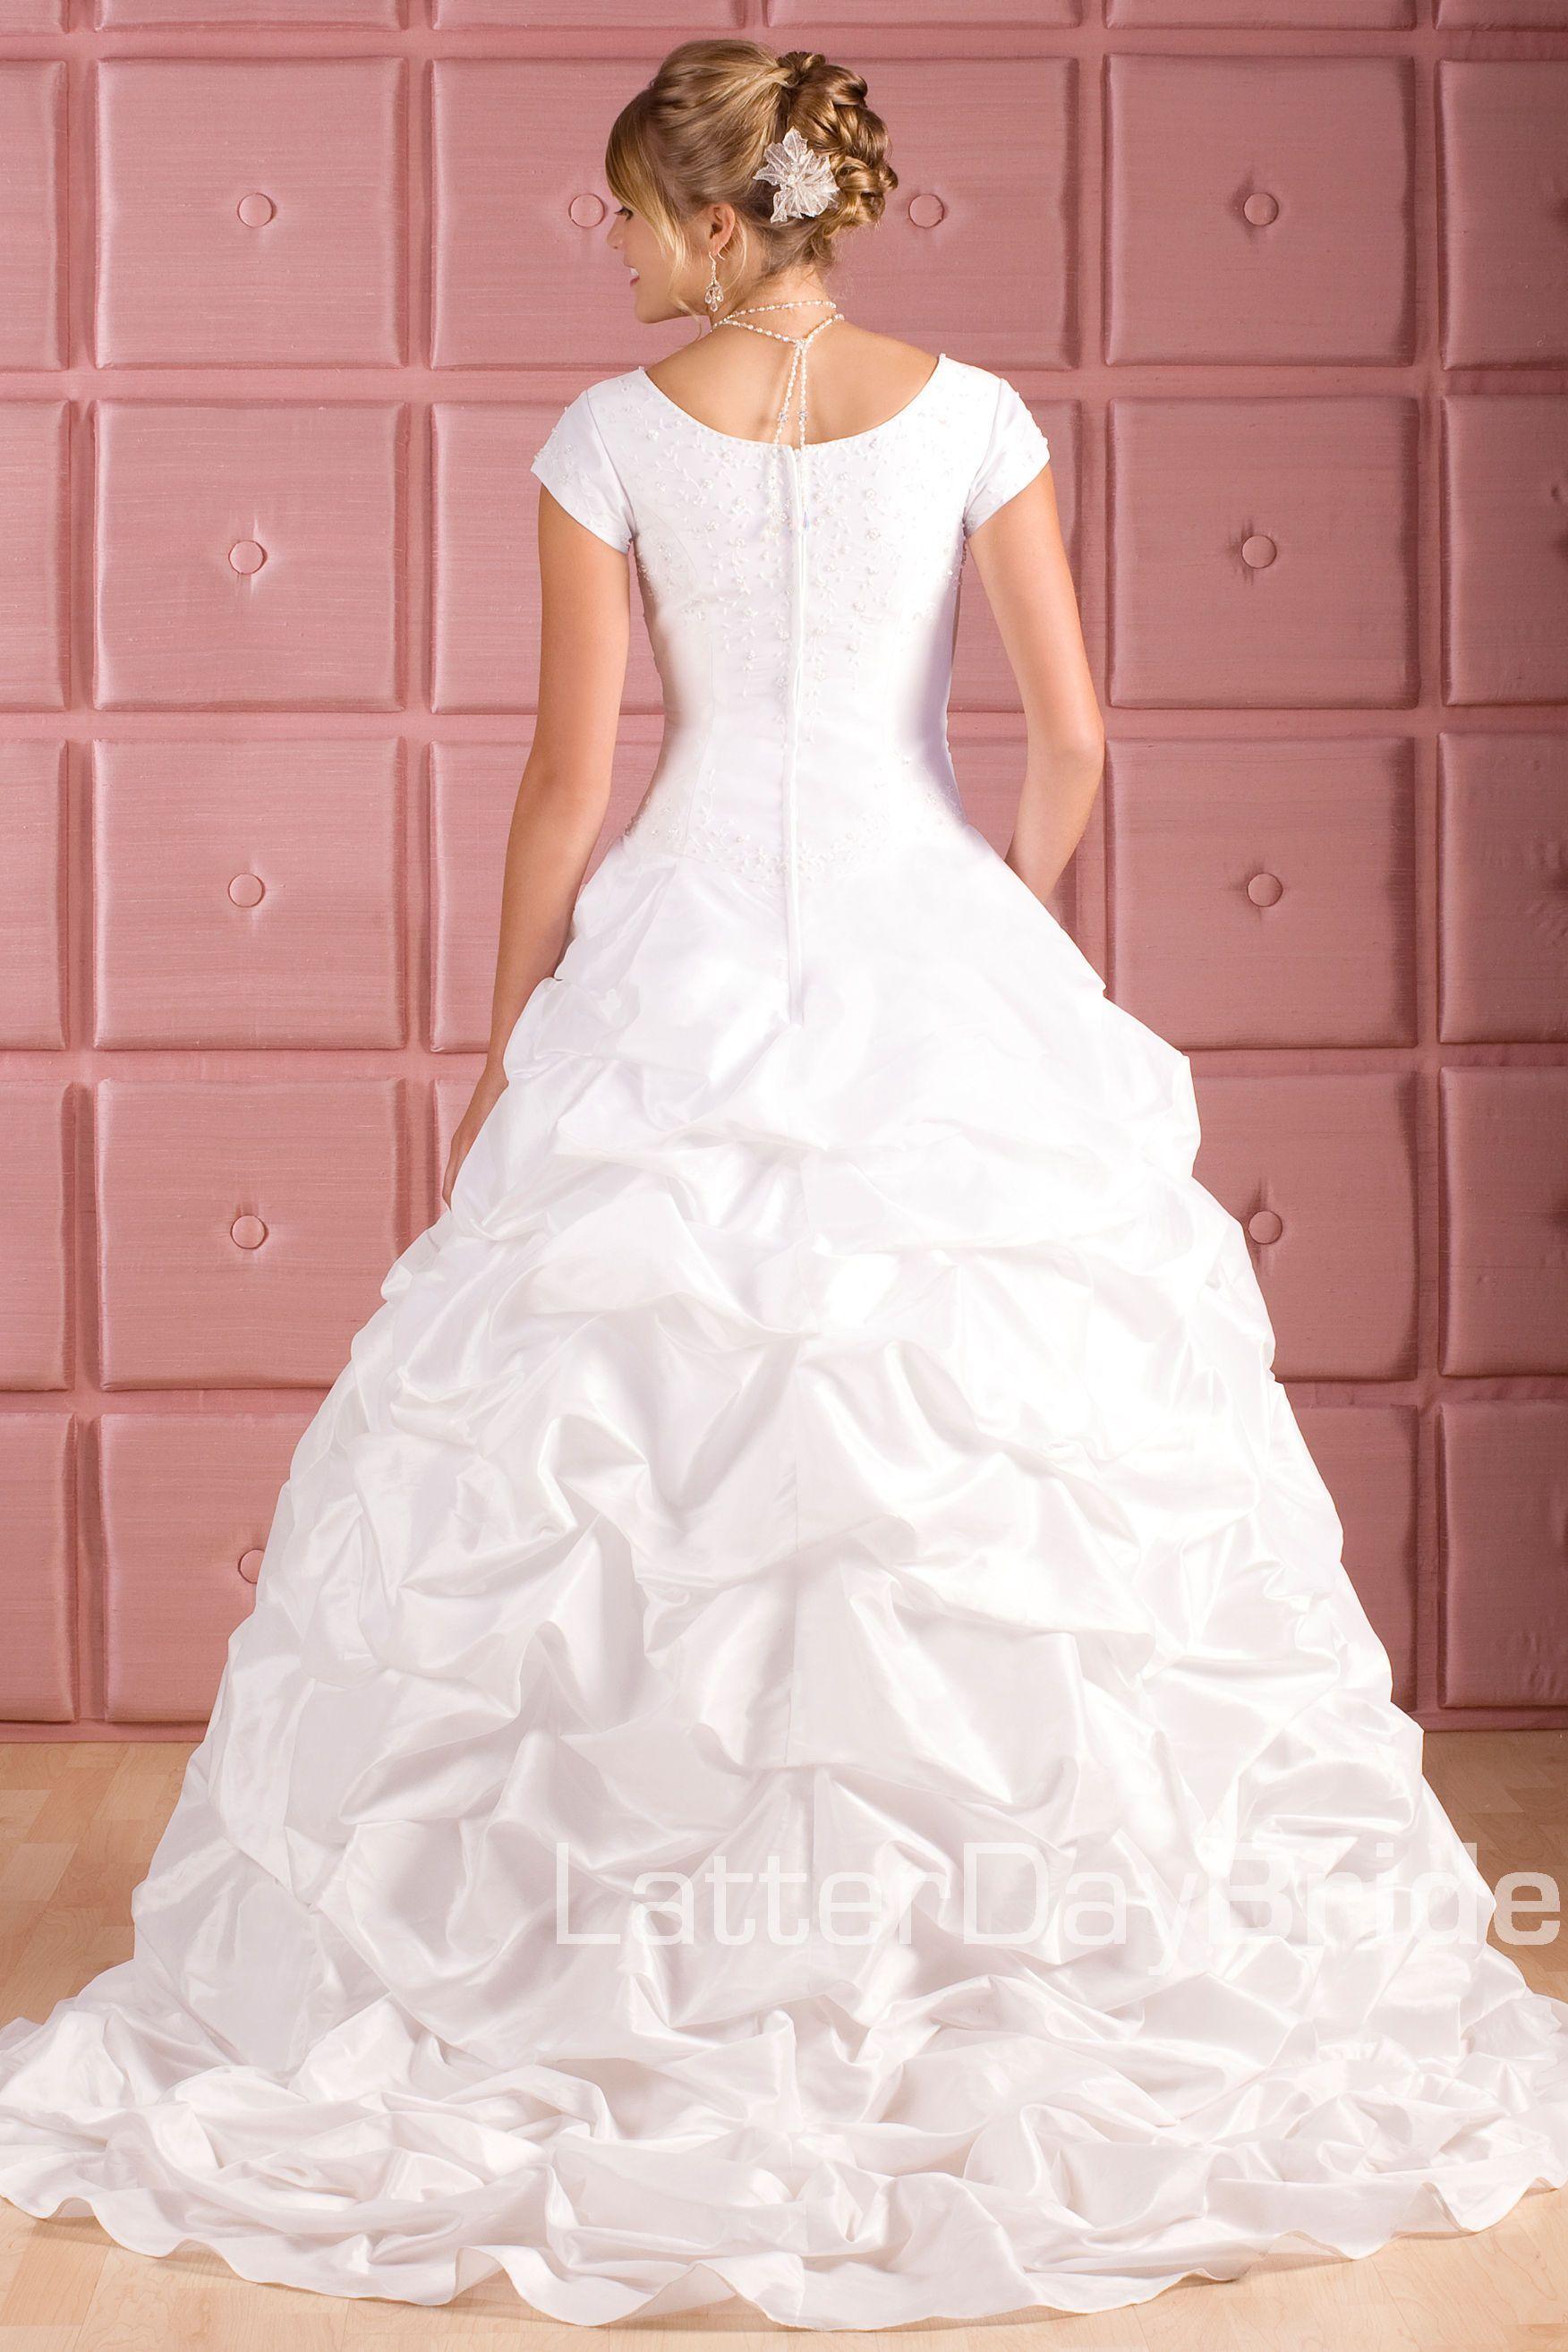 Modest Wedding Dress, Lakewood LatterDayBride & Prom